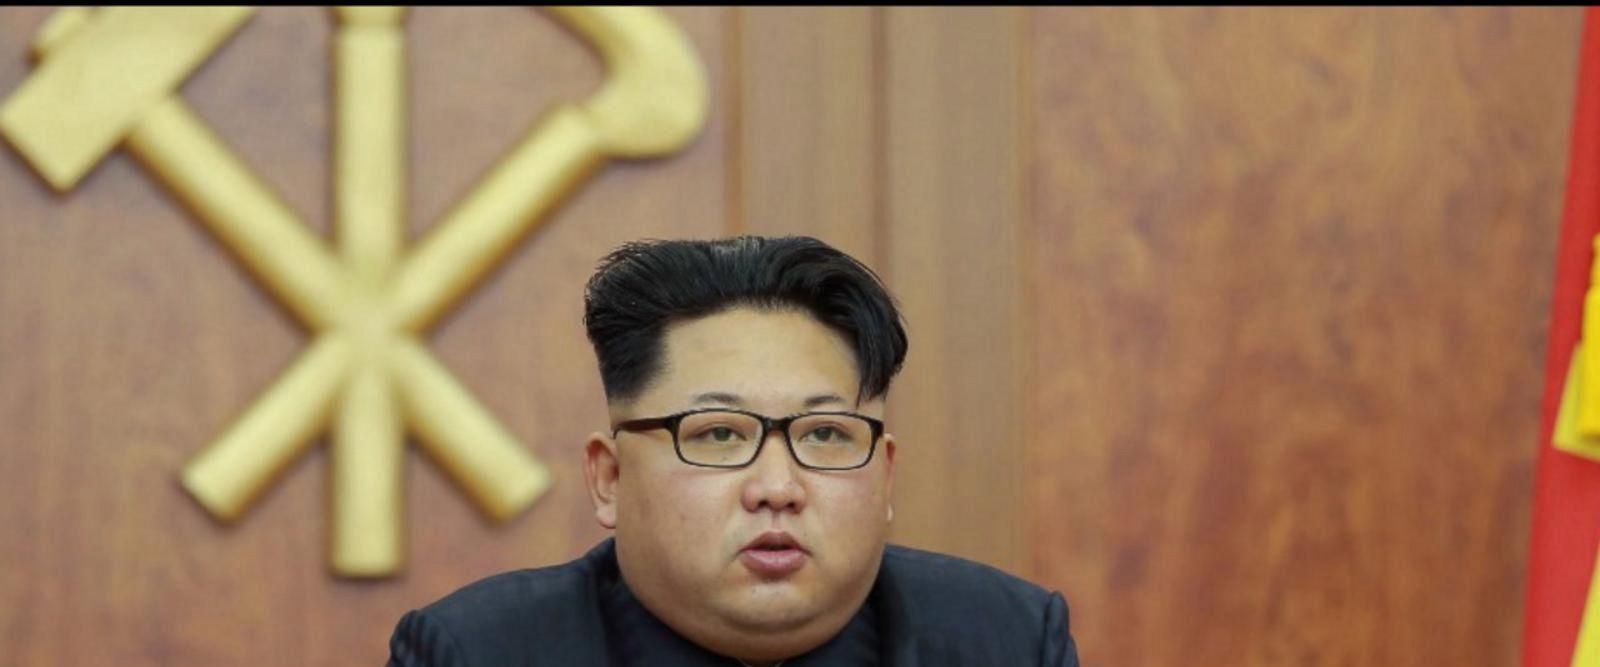 VIDEO: North Korean leader says he's suspending nuclear program